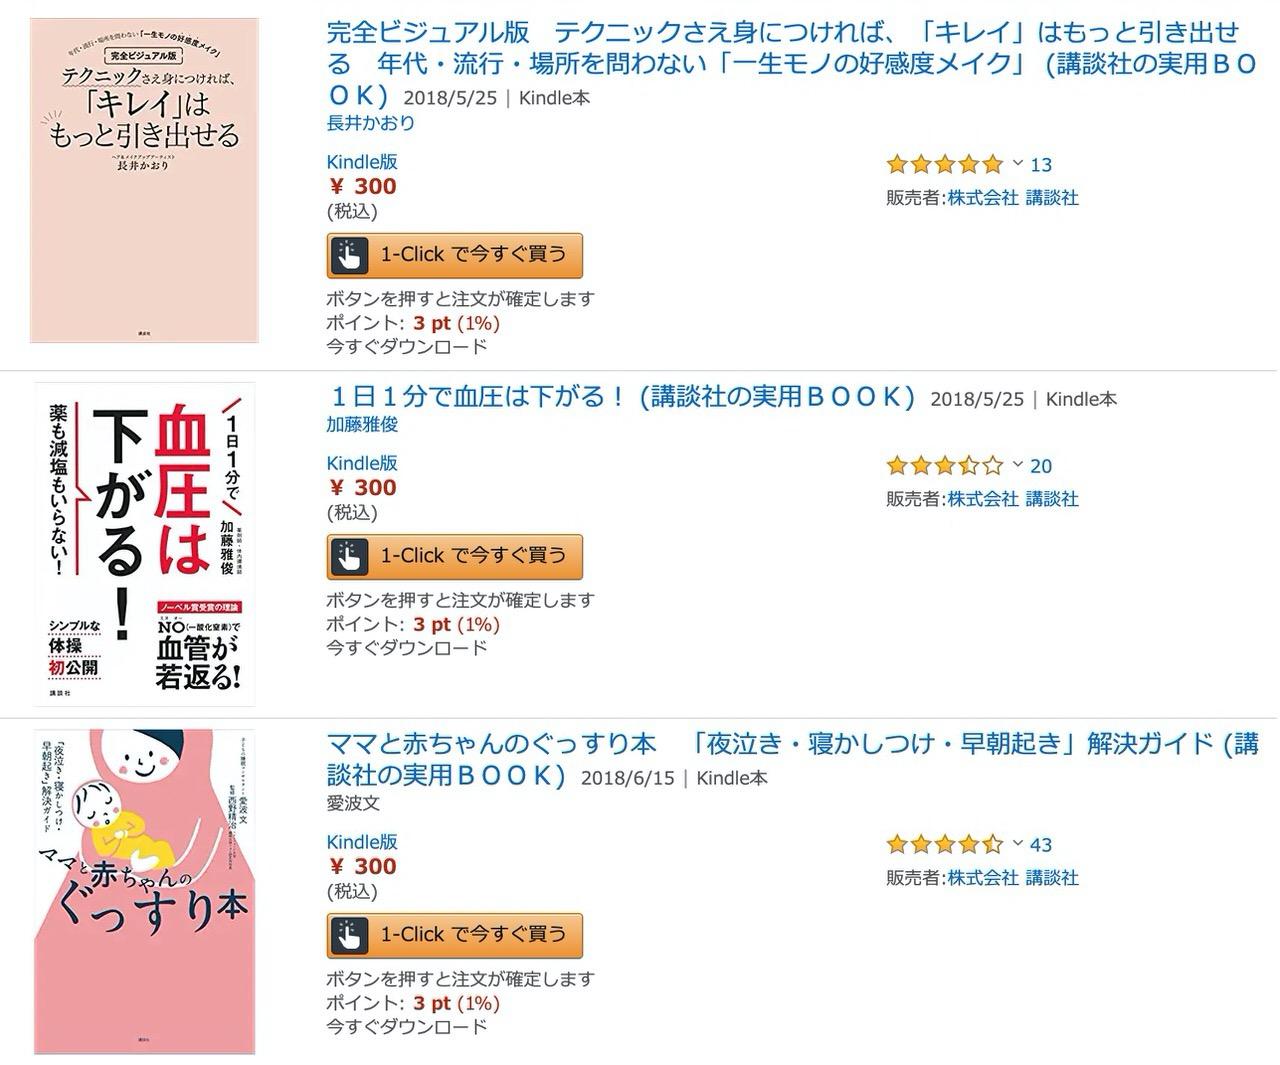 【Kindleセール】300円均一「人生がちょっと快適になる 趣味・実用書フェア」(10/31まで)